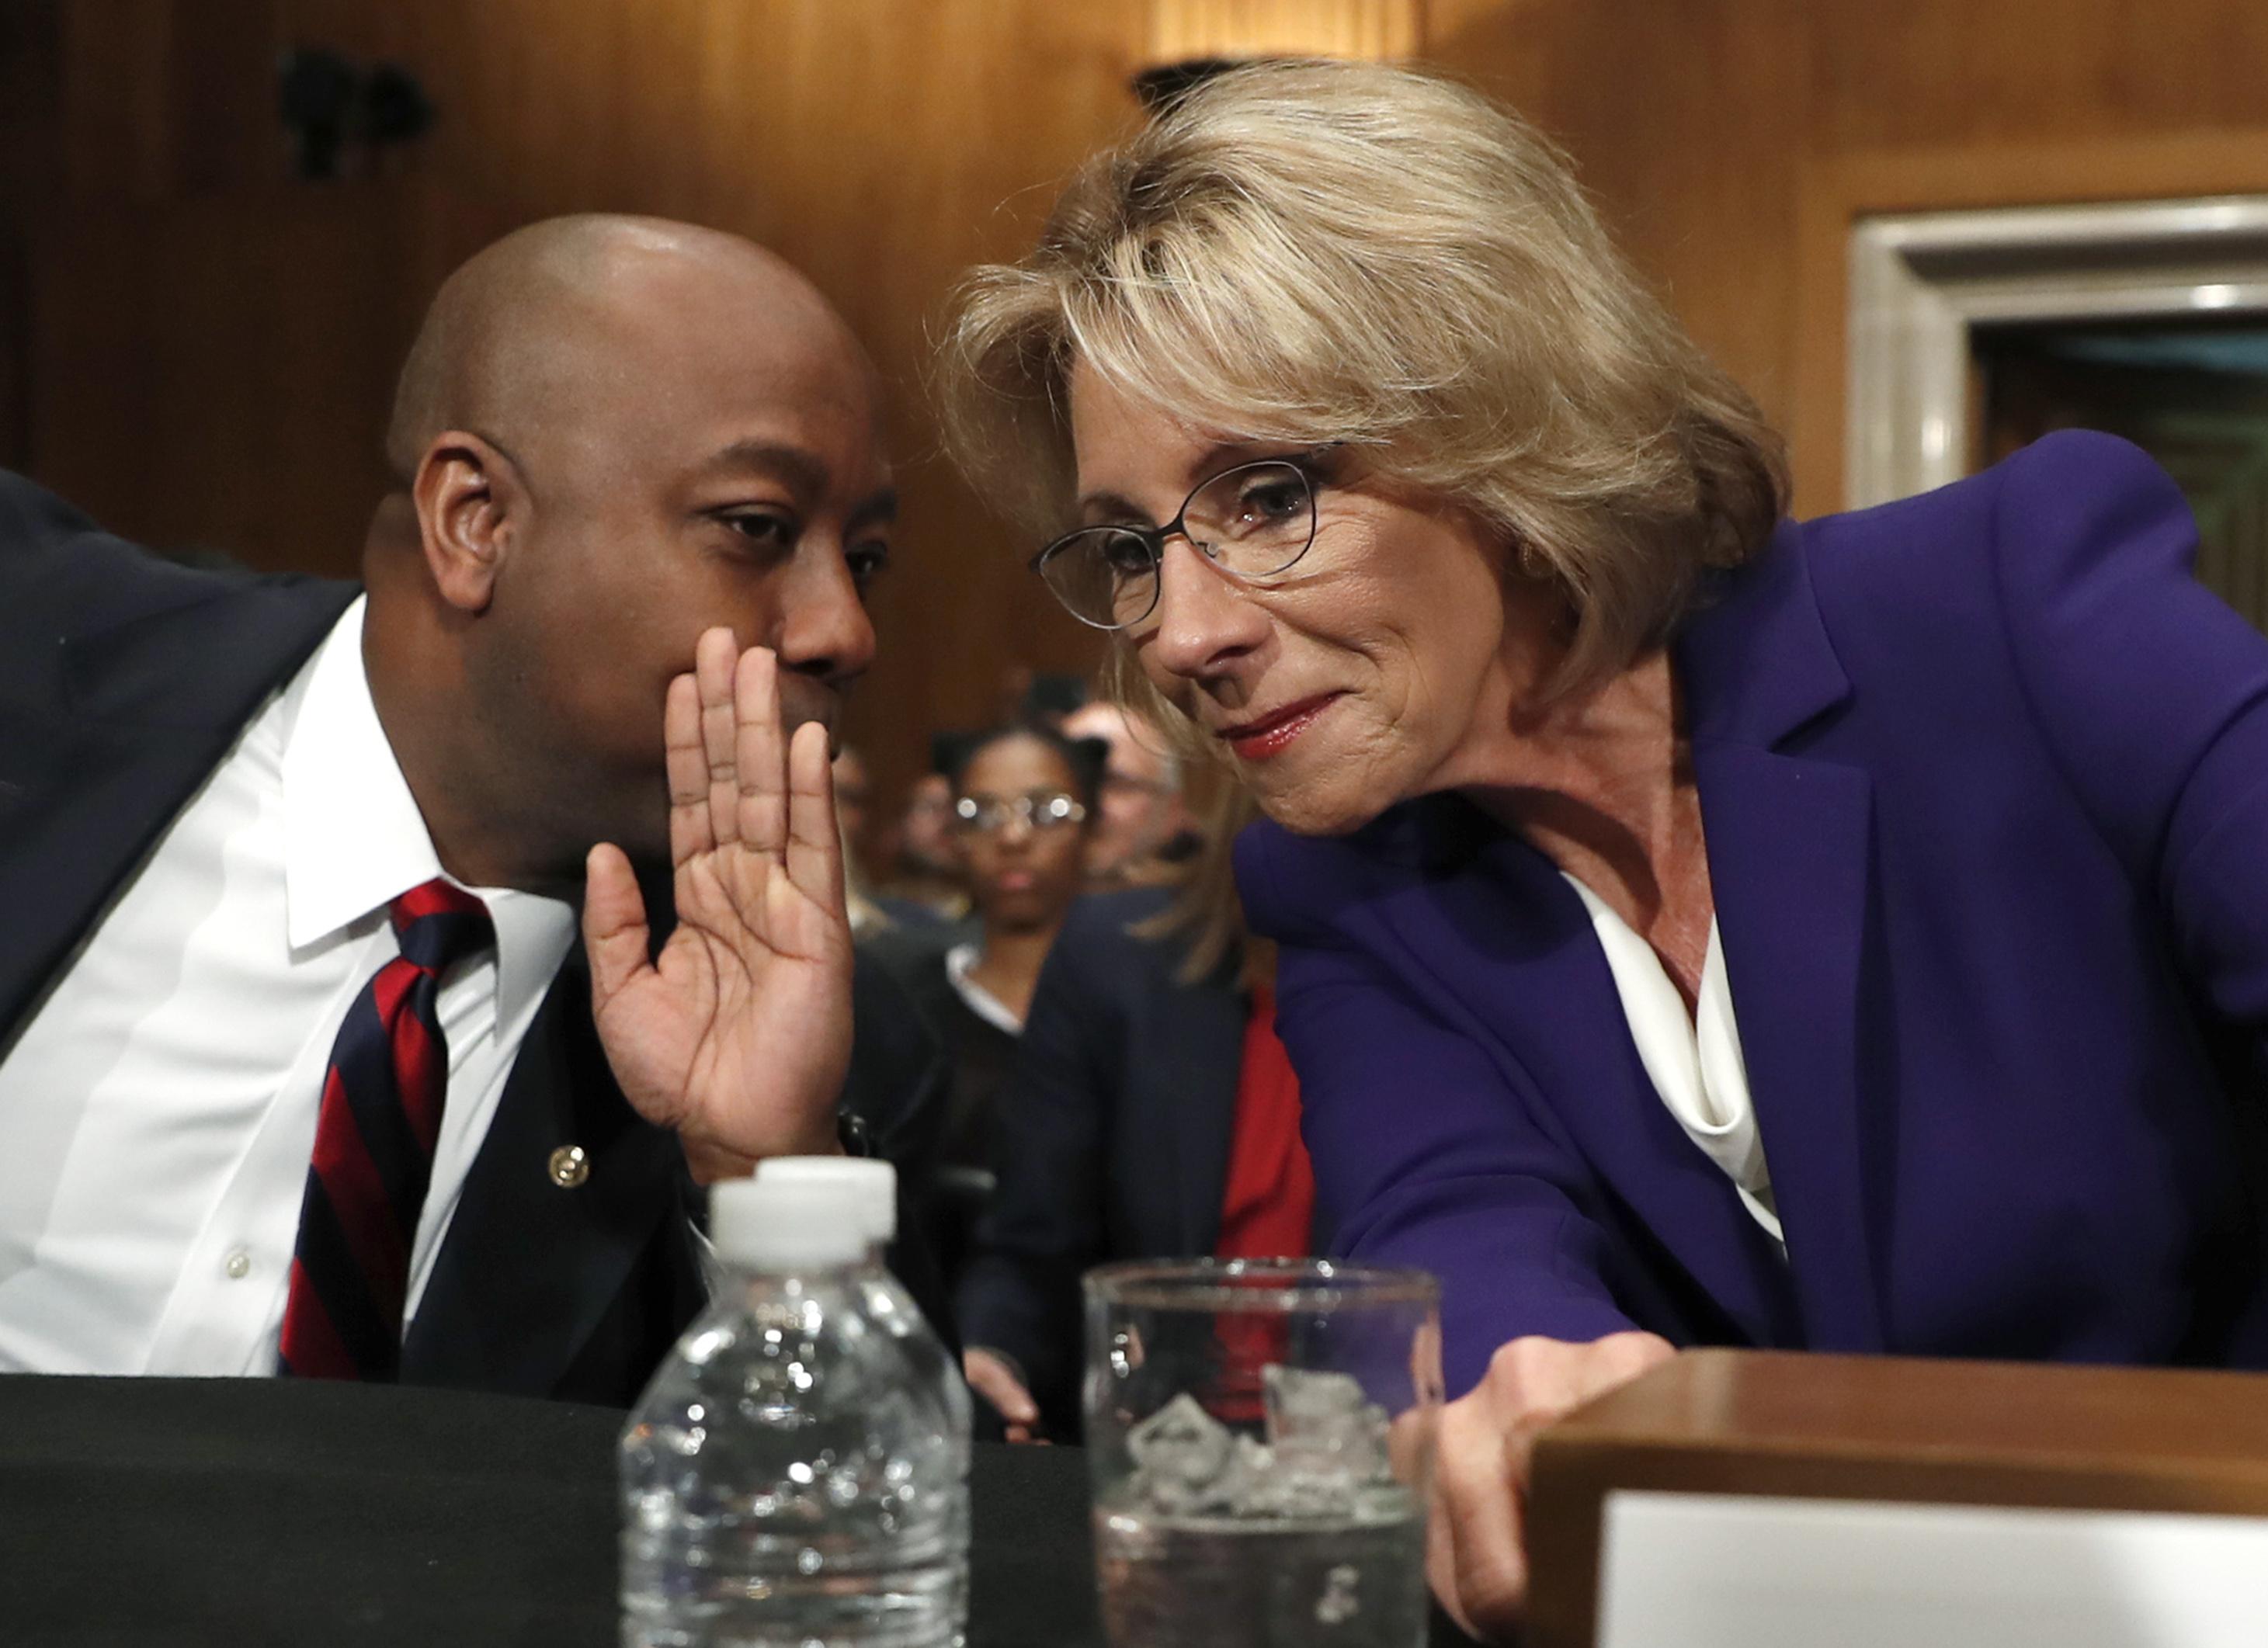 Education Secretary-designate Betsy DeVos talks to Sen. Tim Scott, R-S.C., before testifying on Capitol Hill in Washington on Jan. 17, 2017. (AP Photo/Carolyn Kaster)